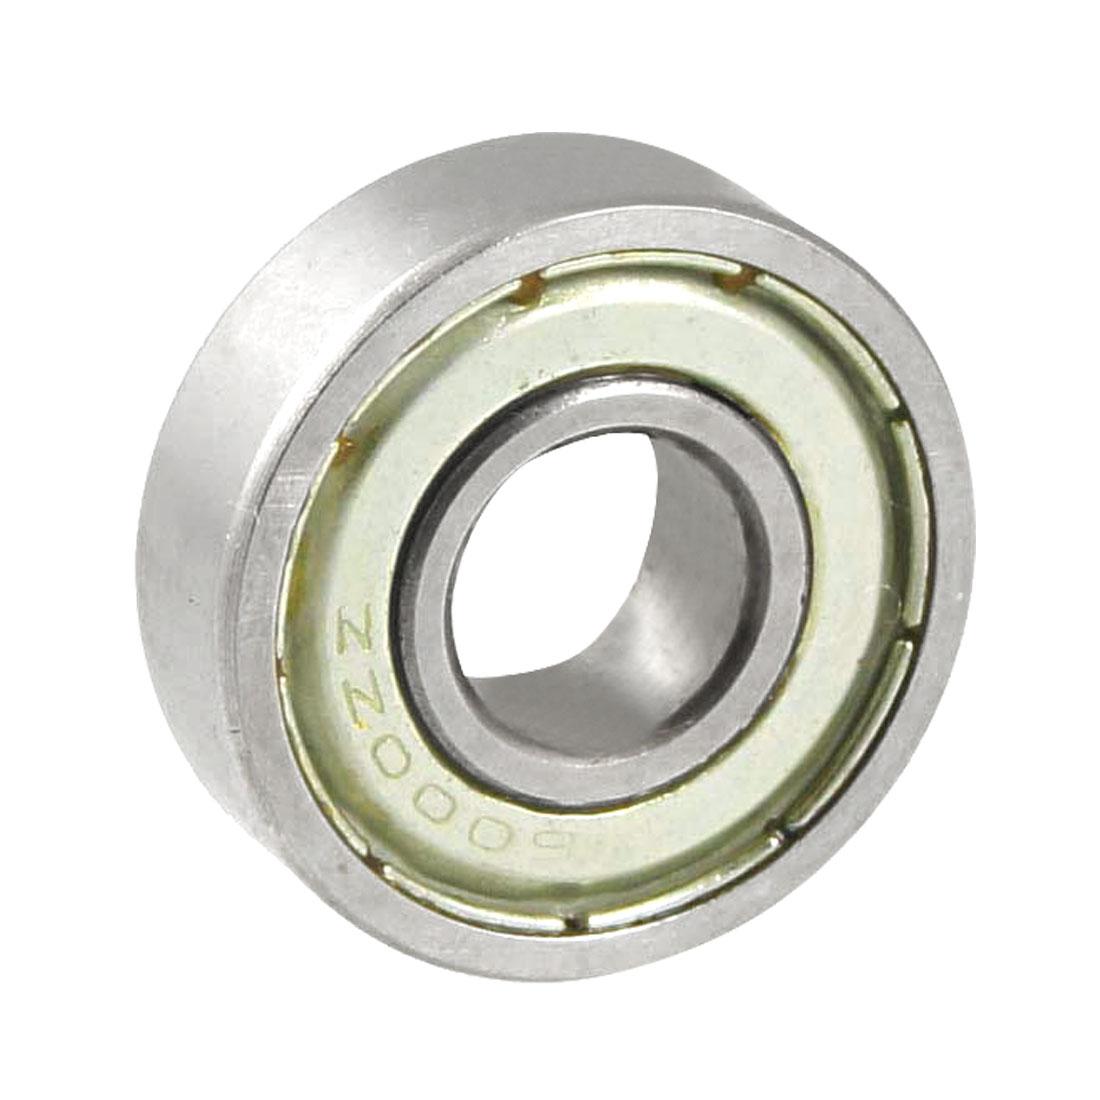 Silver Tone 6000ZZ 26mm x 9mm x 8mm Metal Shield Ball Bearing